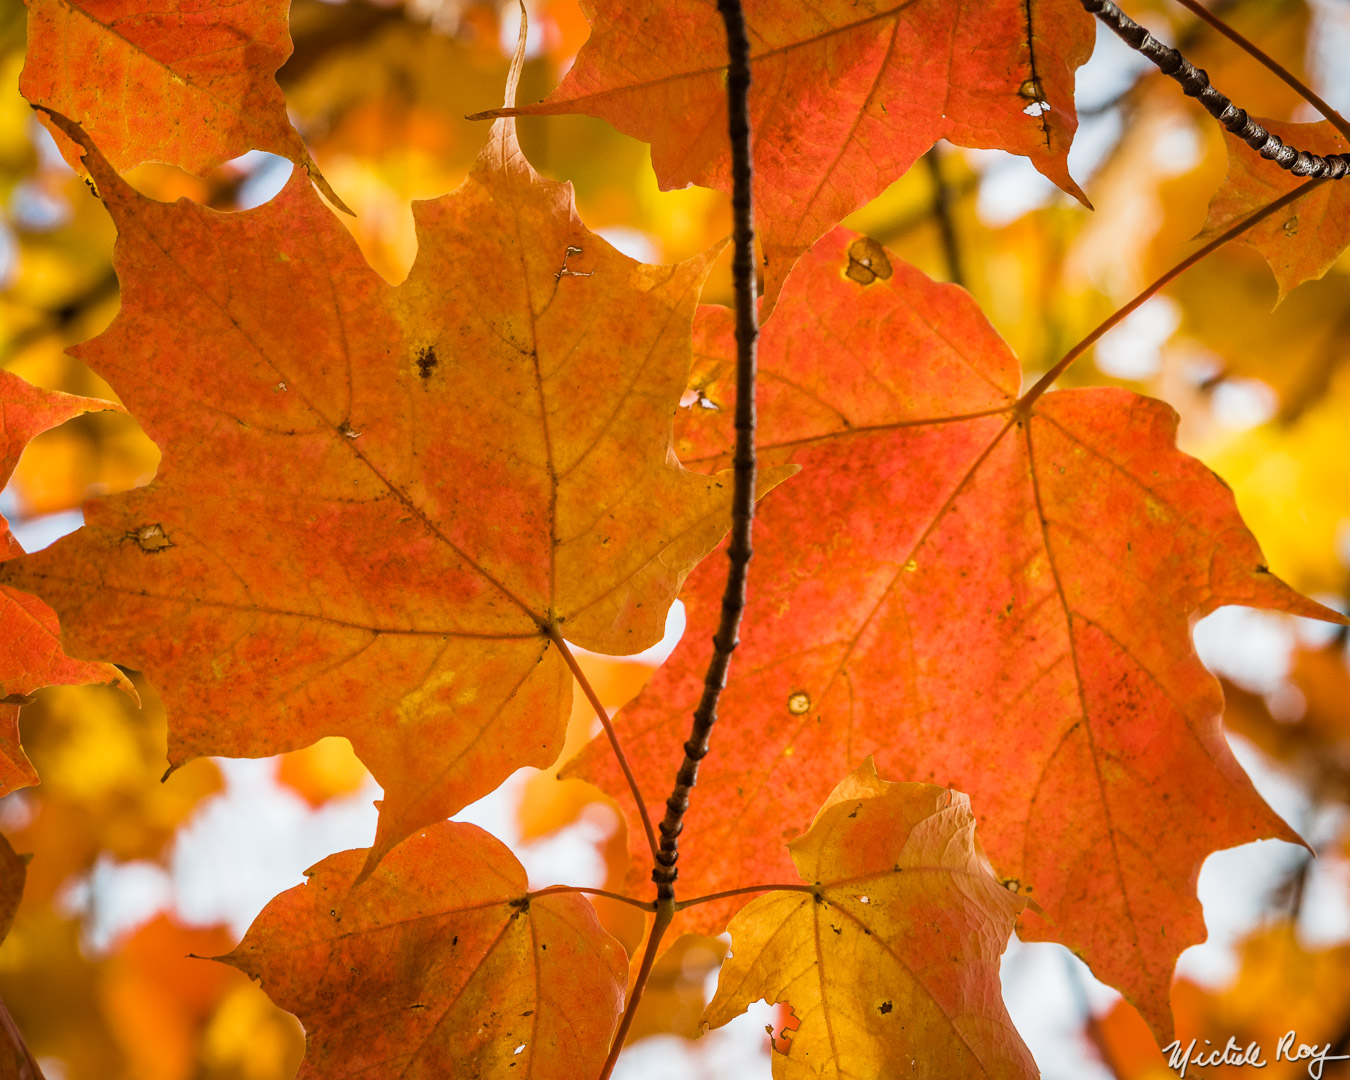 Couleurs automnales (10) / Fall colors (10)